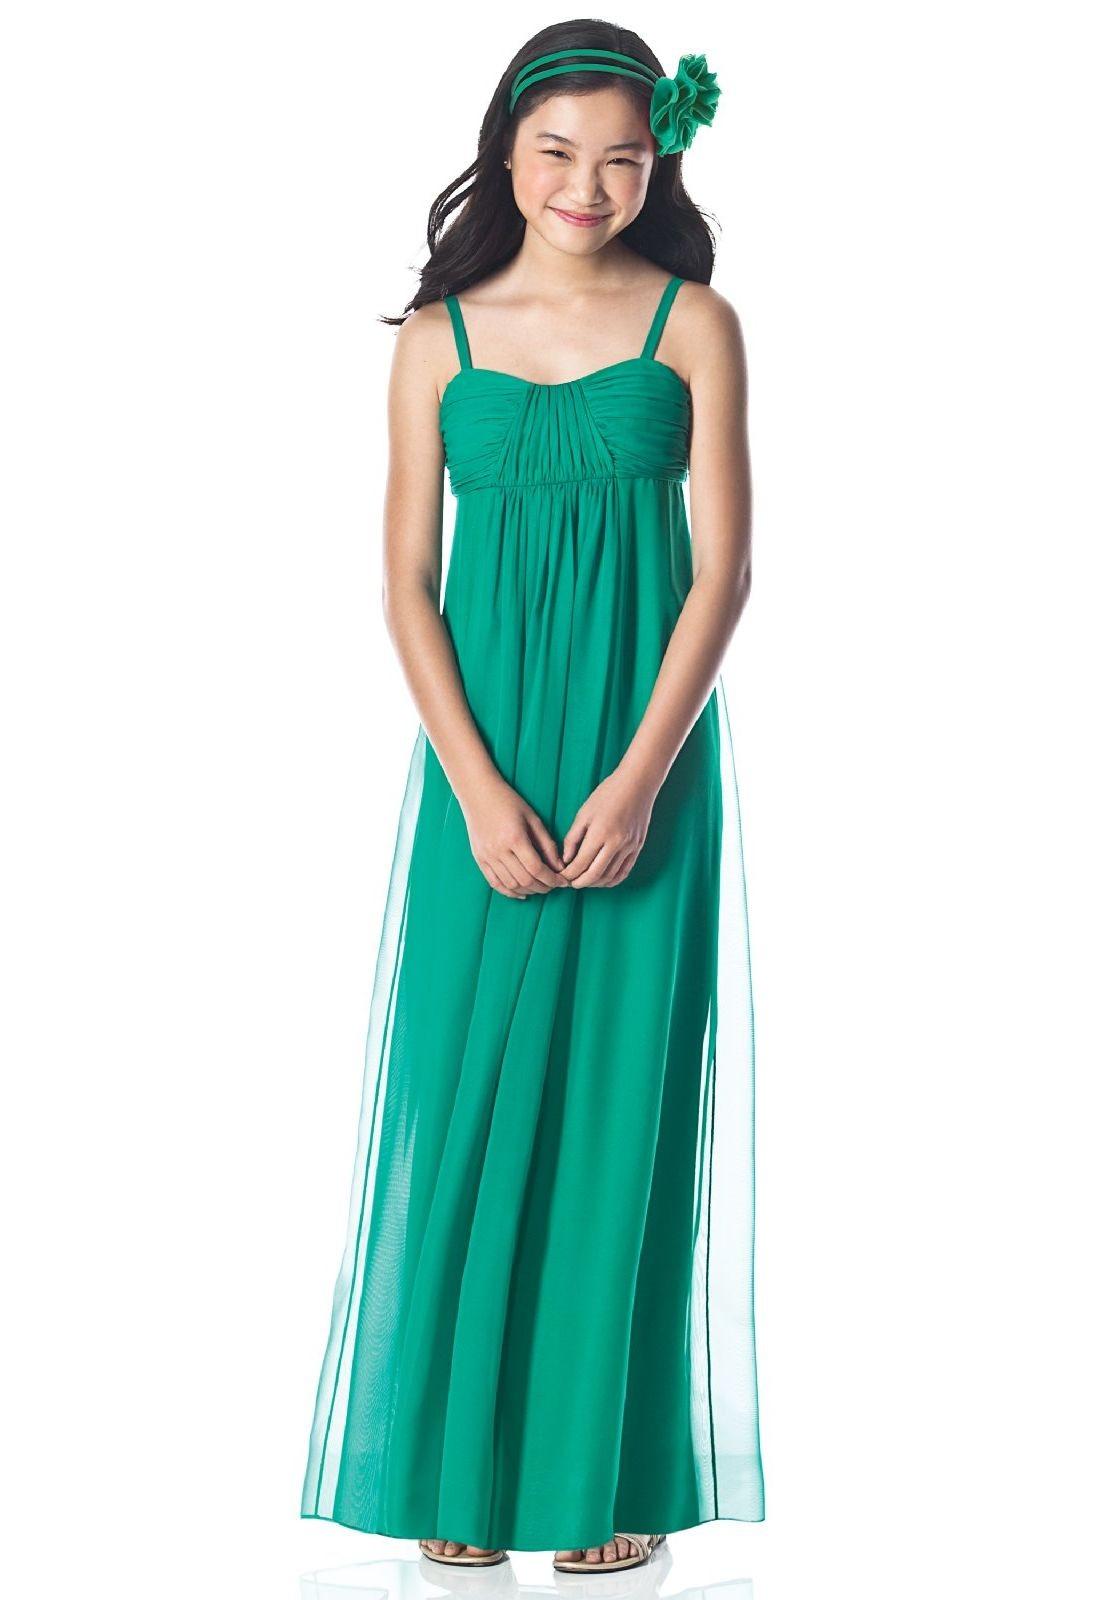 Junior bridesmaid dresses dressed up girl long junior bridesmaid dresses ombrellifo Gallery